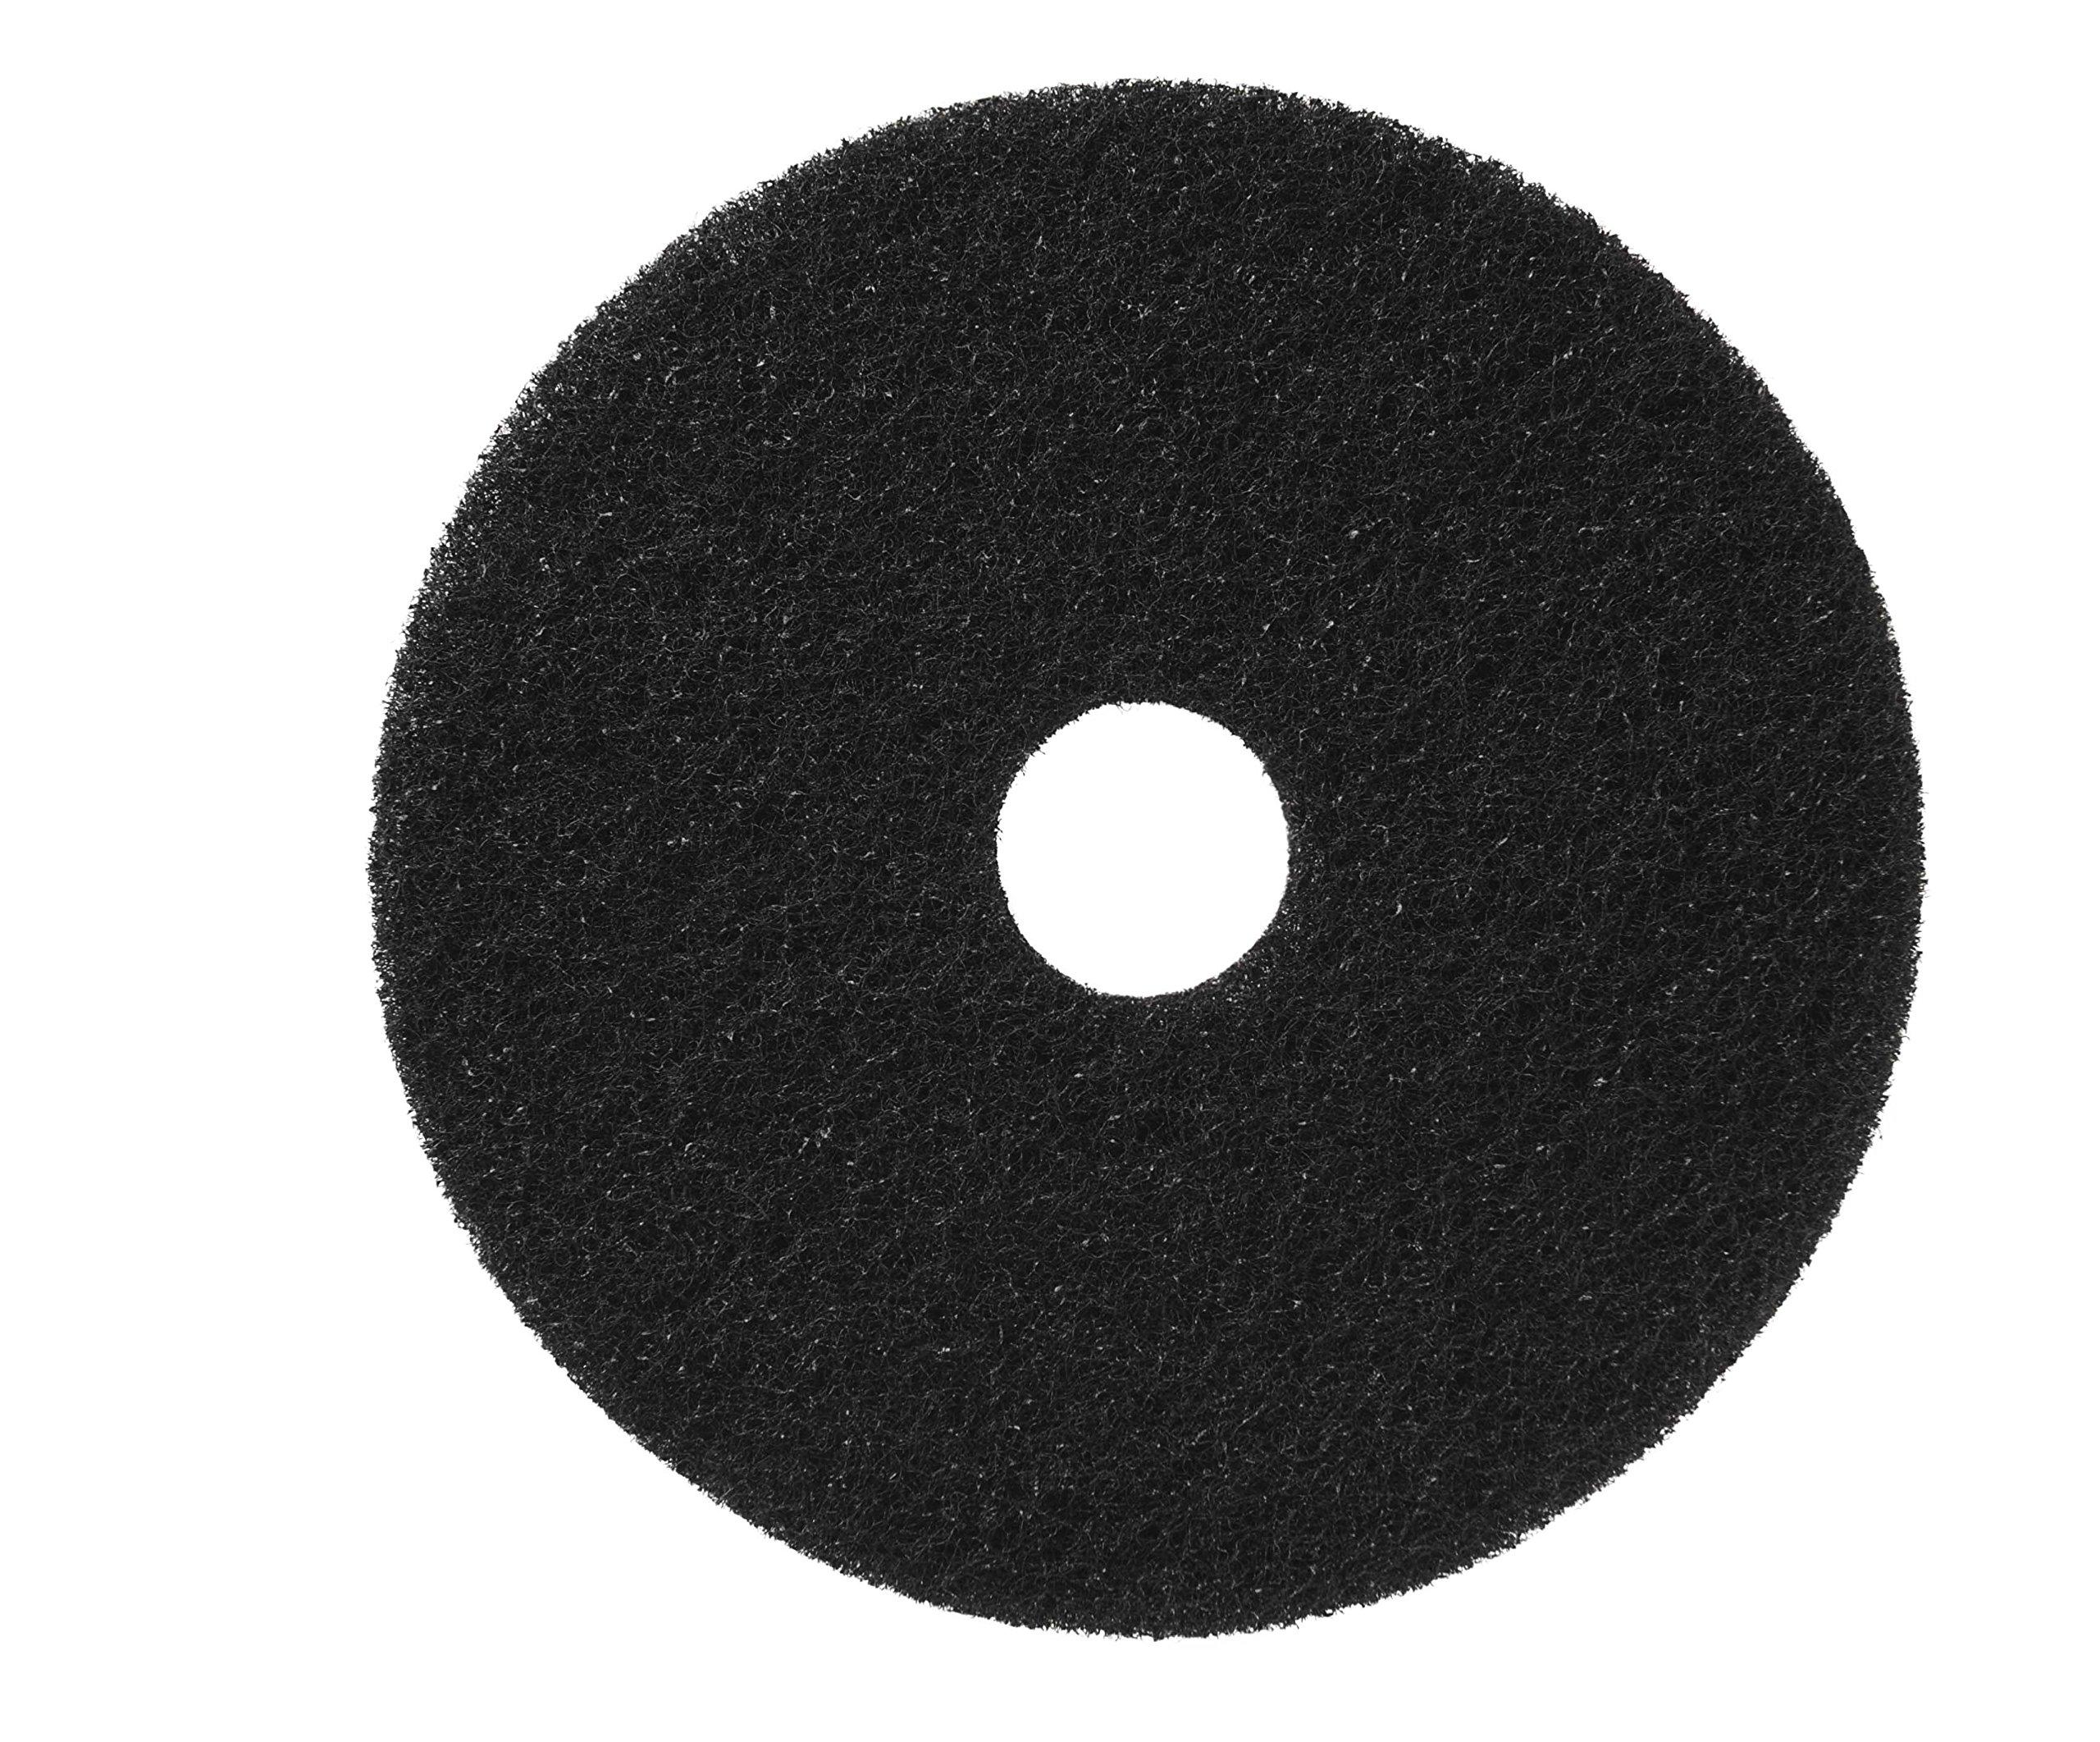 Glit / Microtron 400117 Standard Strip Pad, 17'', Black (Pack of 5)